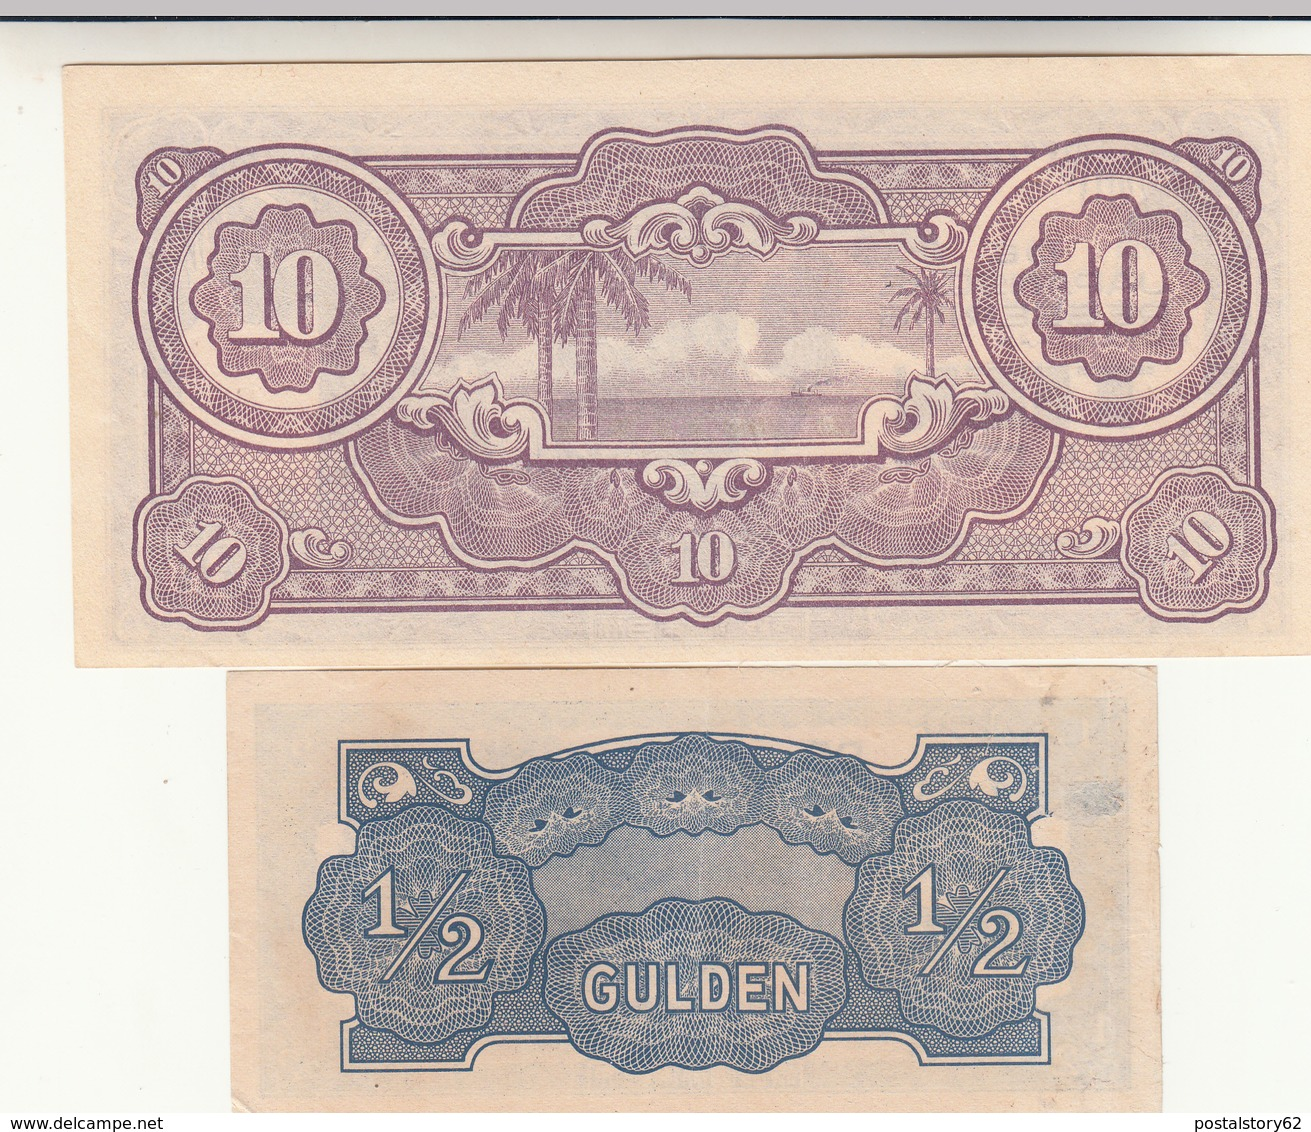 De Japansche Regeering Half Gulden + Tien Gulden Invasione Giapponese Paesi Bassi. - Paesi Bassi